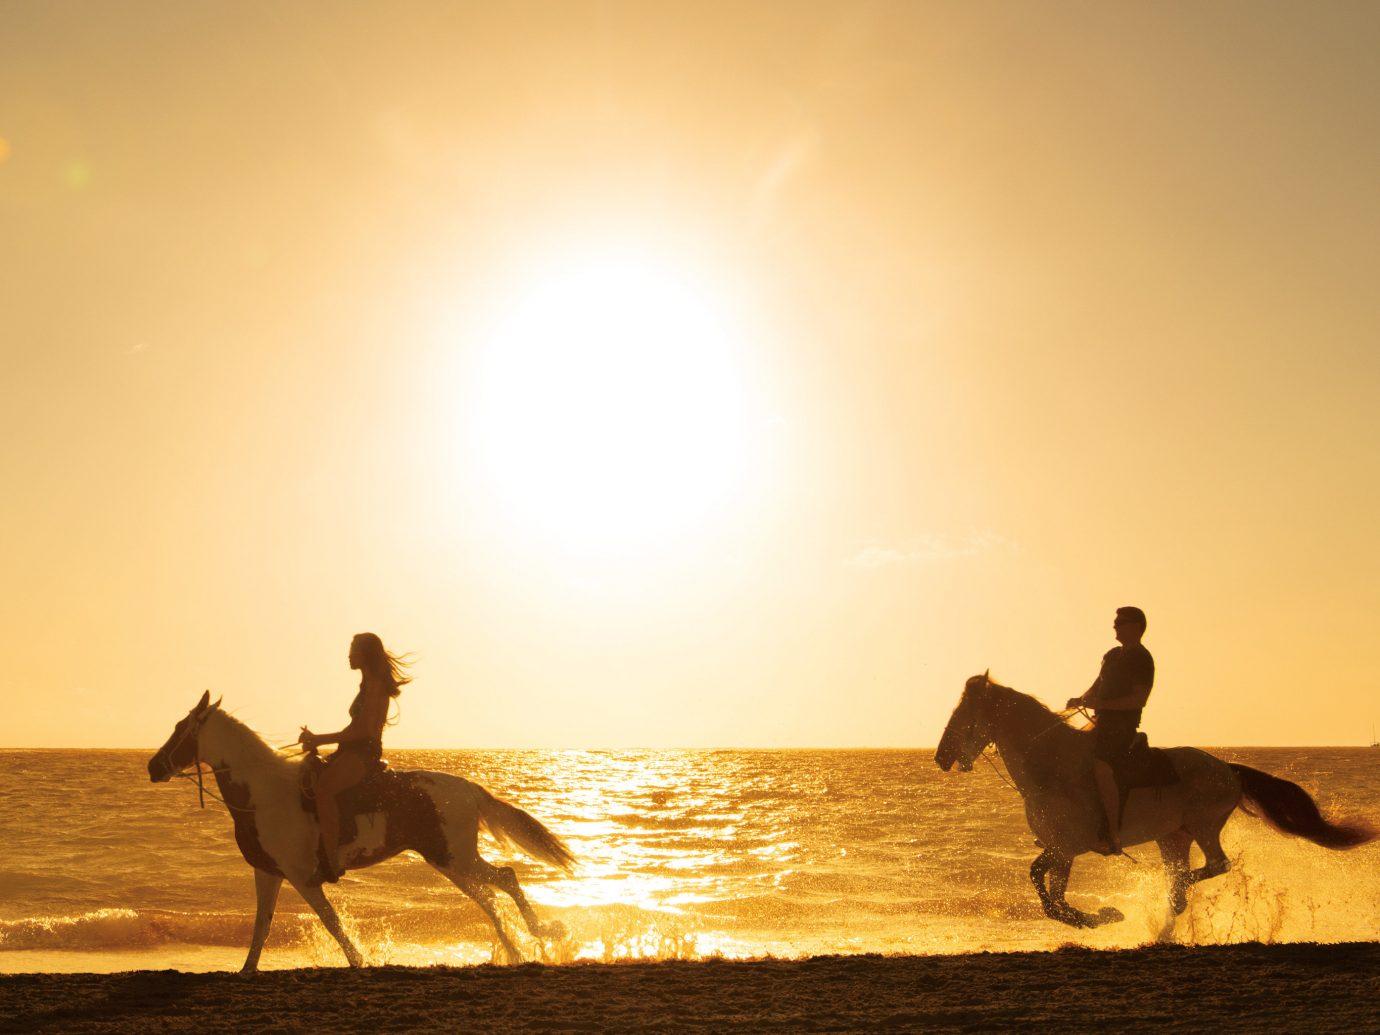 Hotels sky outdoor water mammal mustang horse morning Camel Sunset landscape evening horse like mammal Desert sahara